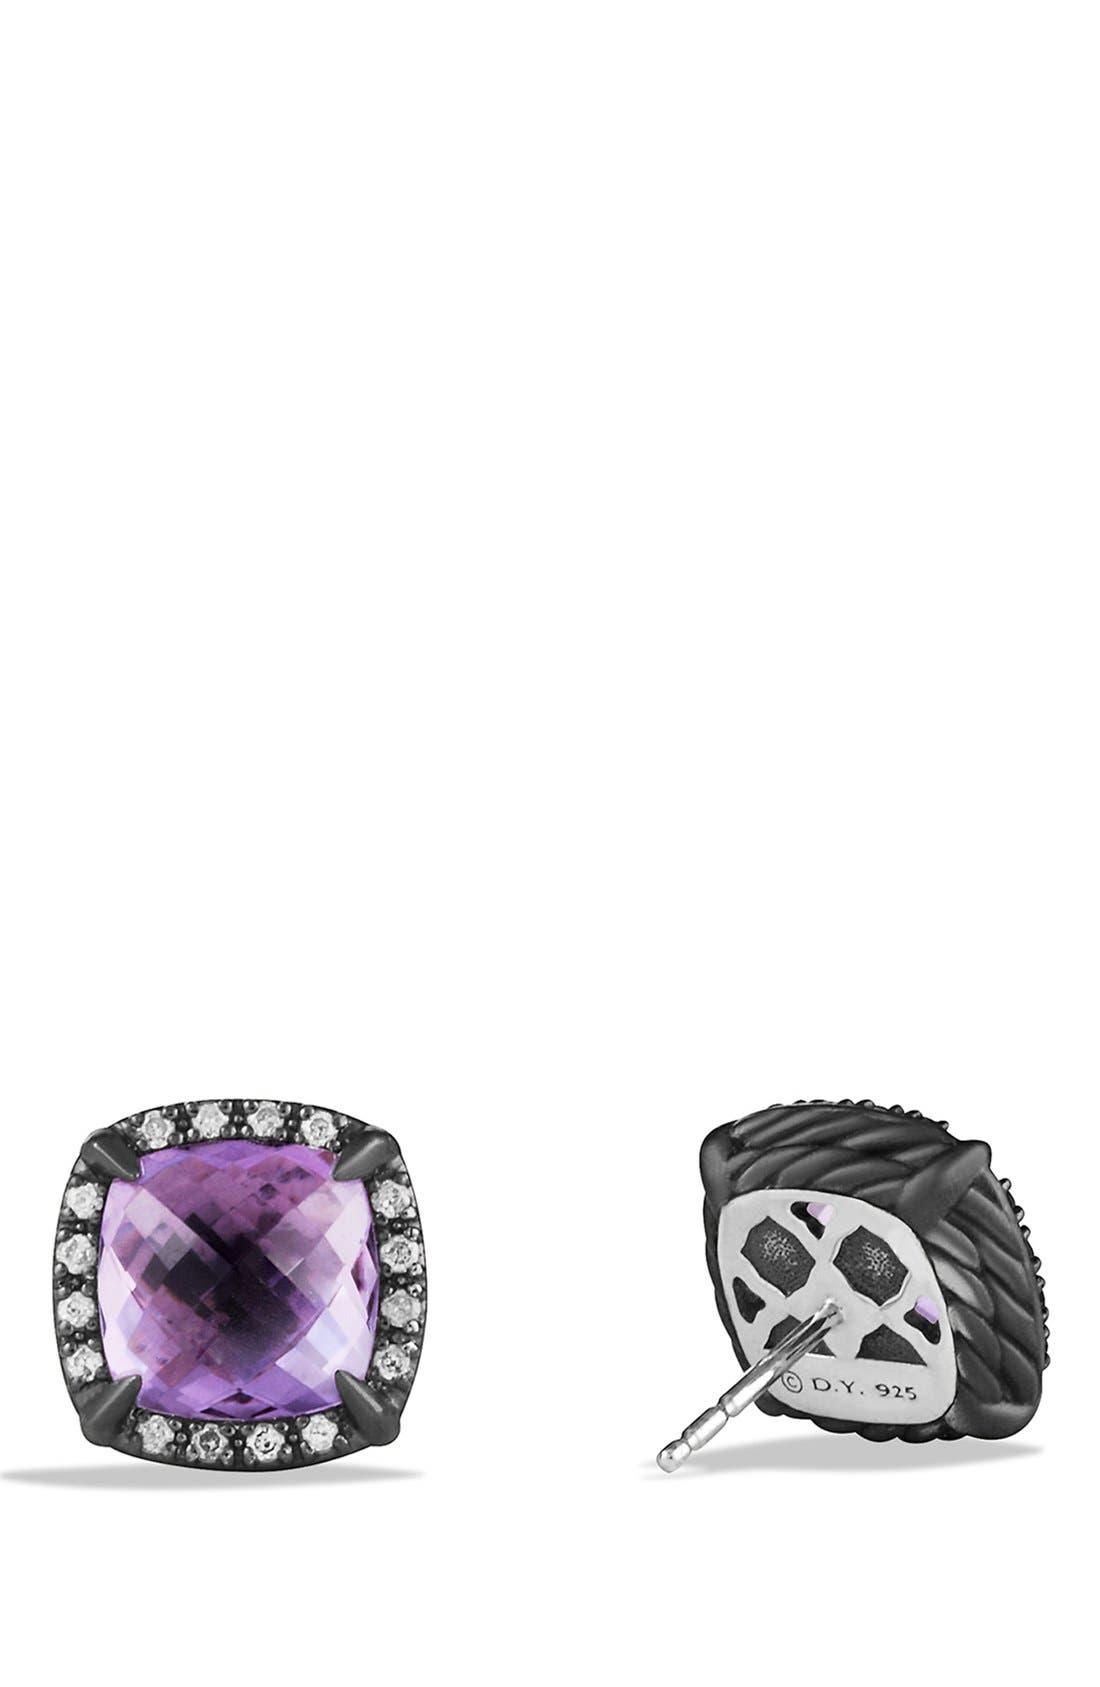 Alternate Image 2  - David Yurman 'Châtelaine' Earrings with Semiprecious Stone and Diamonds